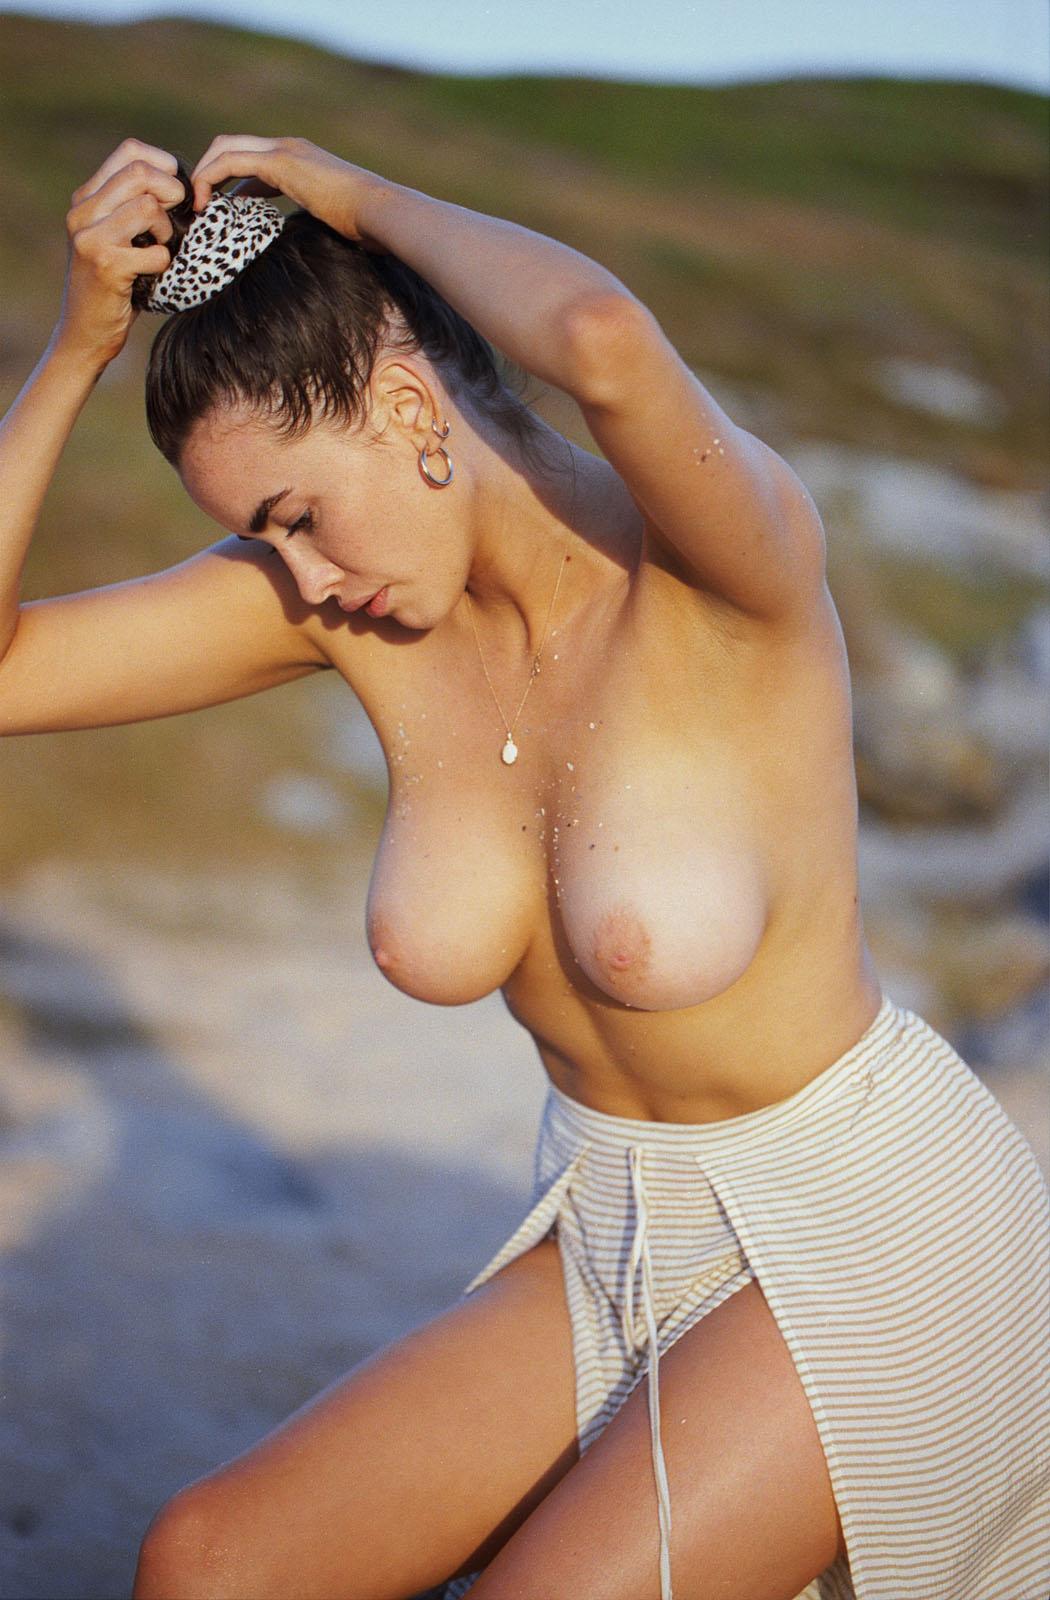 sarah-stephens-seaside-erotic-photo-by-cameron-mackie-32